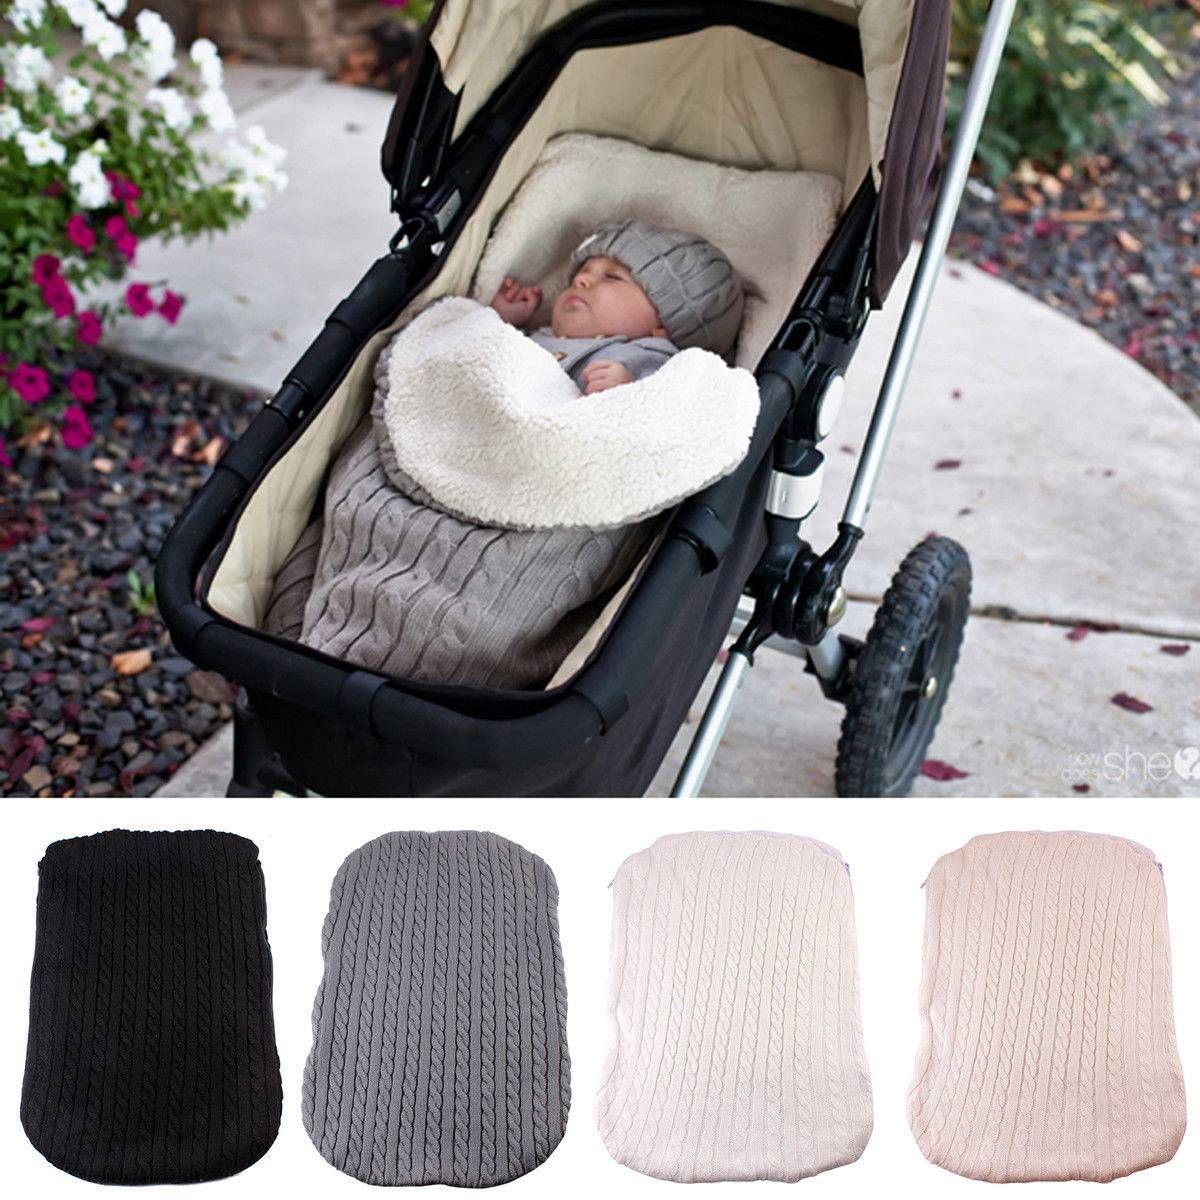 095b39eee 2019 Baby Stroller Sleeping Bag Newborn Autumn Winter Wrap Warm Knitted  Envelope Baby Sweater Winter Suit With Velvet Bags Sleeping Bags For  Toddler Girls ...